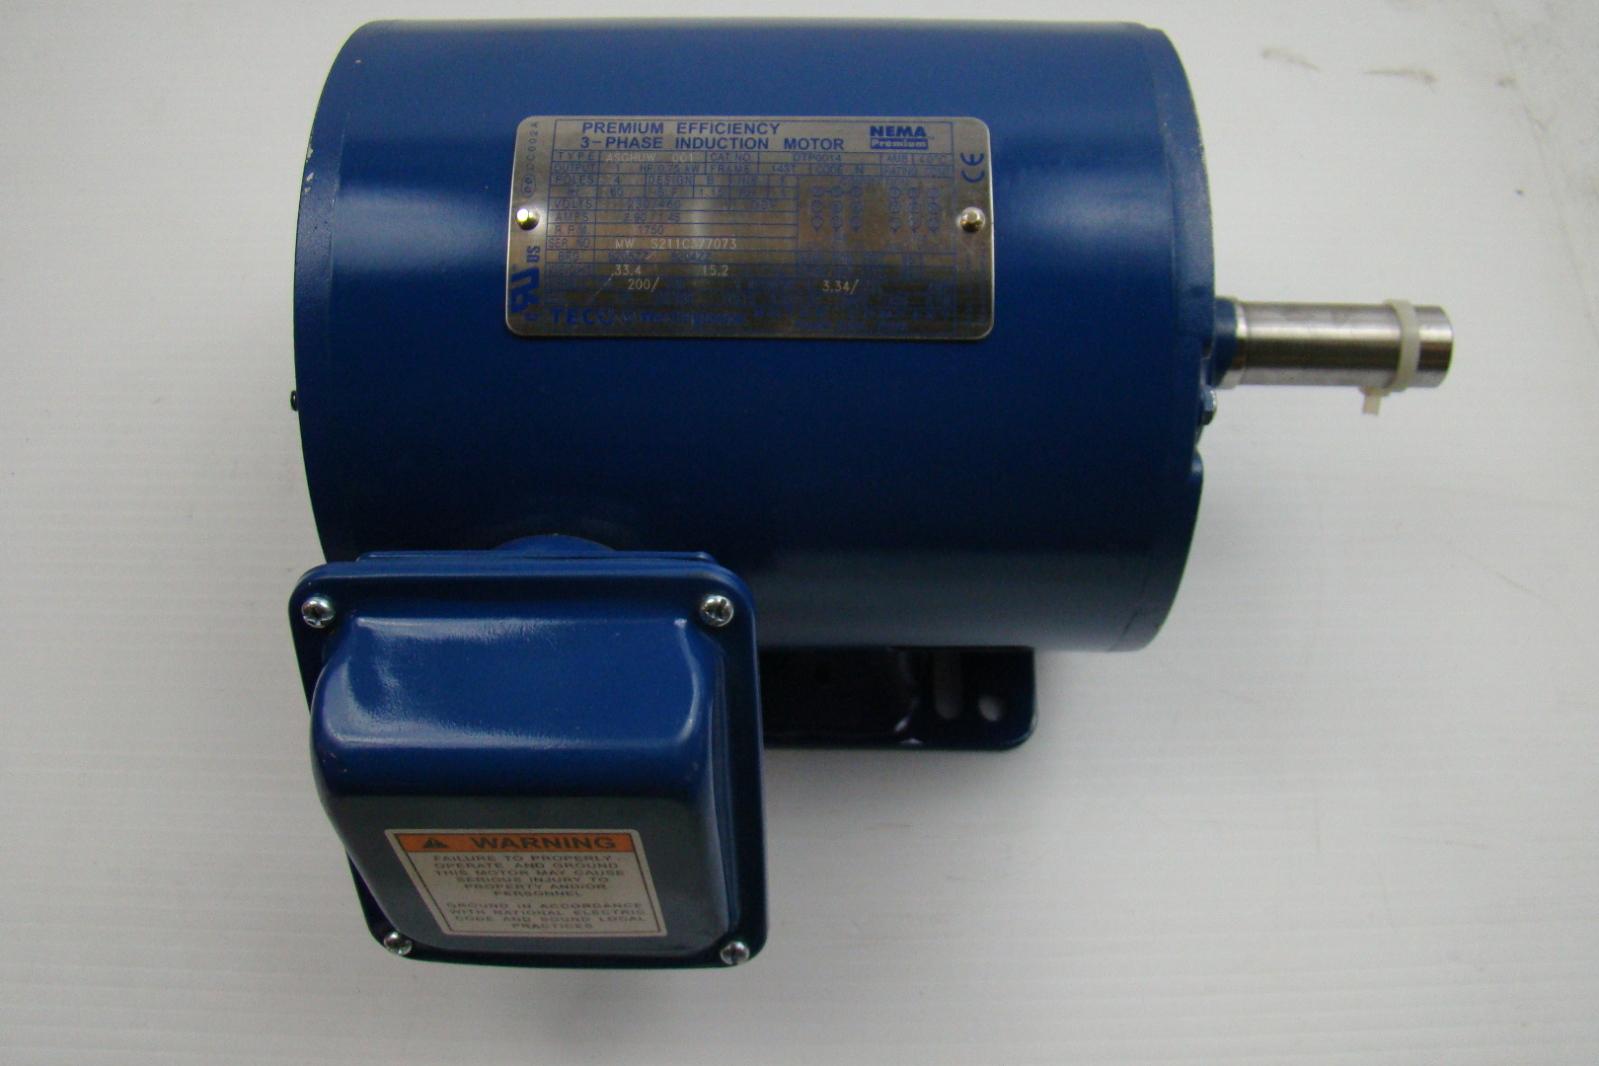 Premium efficiency 1 hp 230 460v induction motor dtp0014 for 1 2 hp induction motor